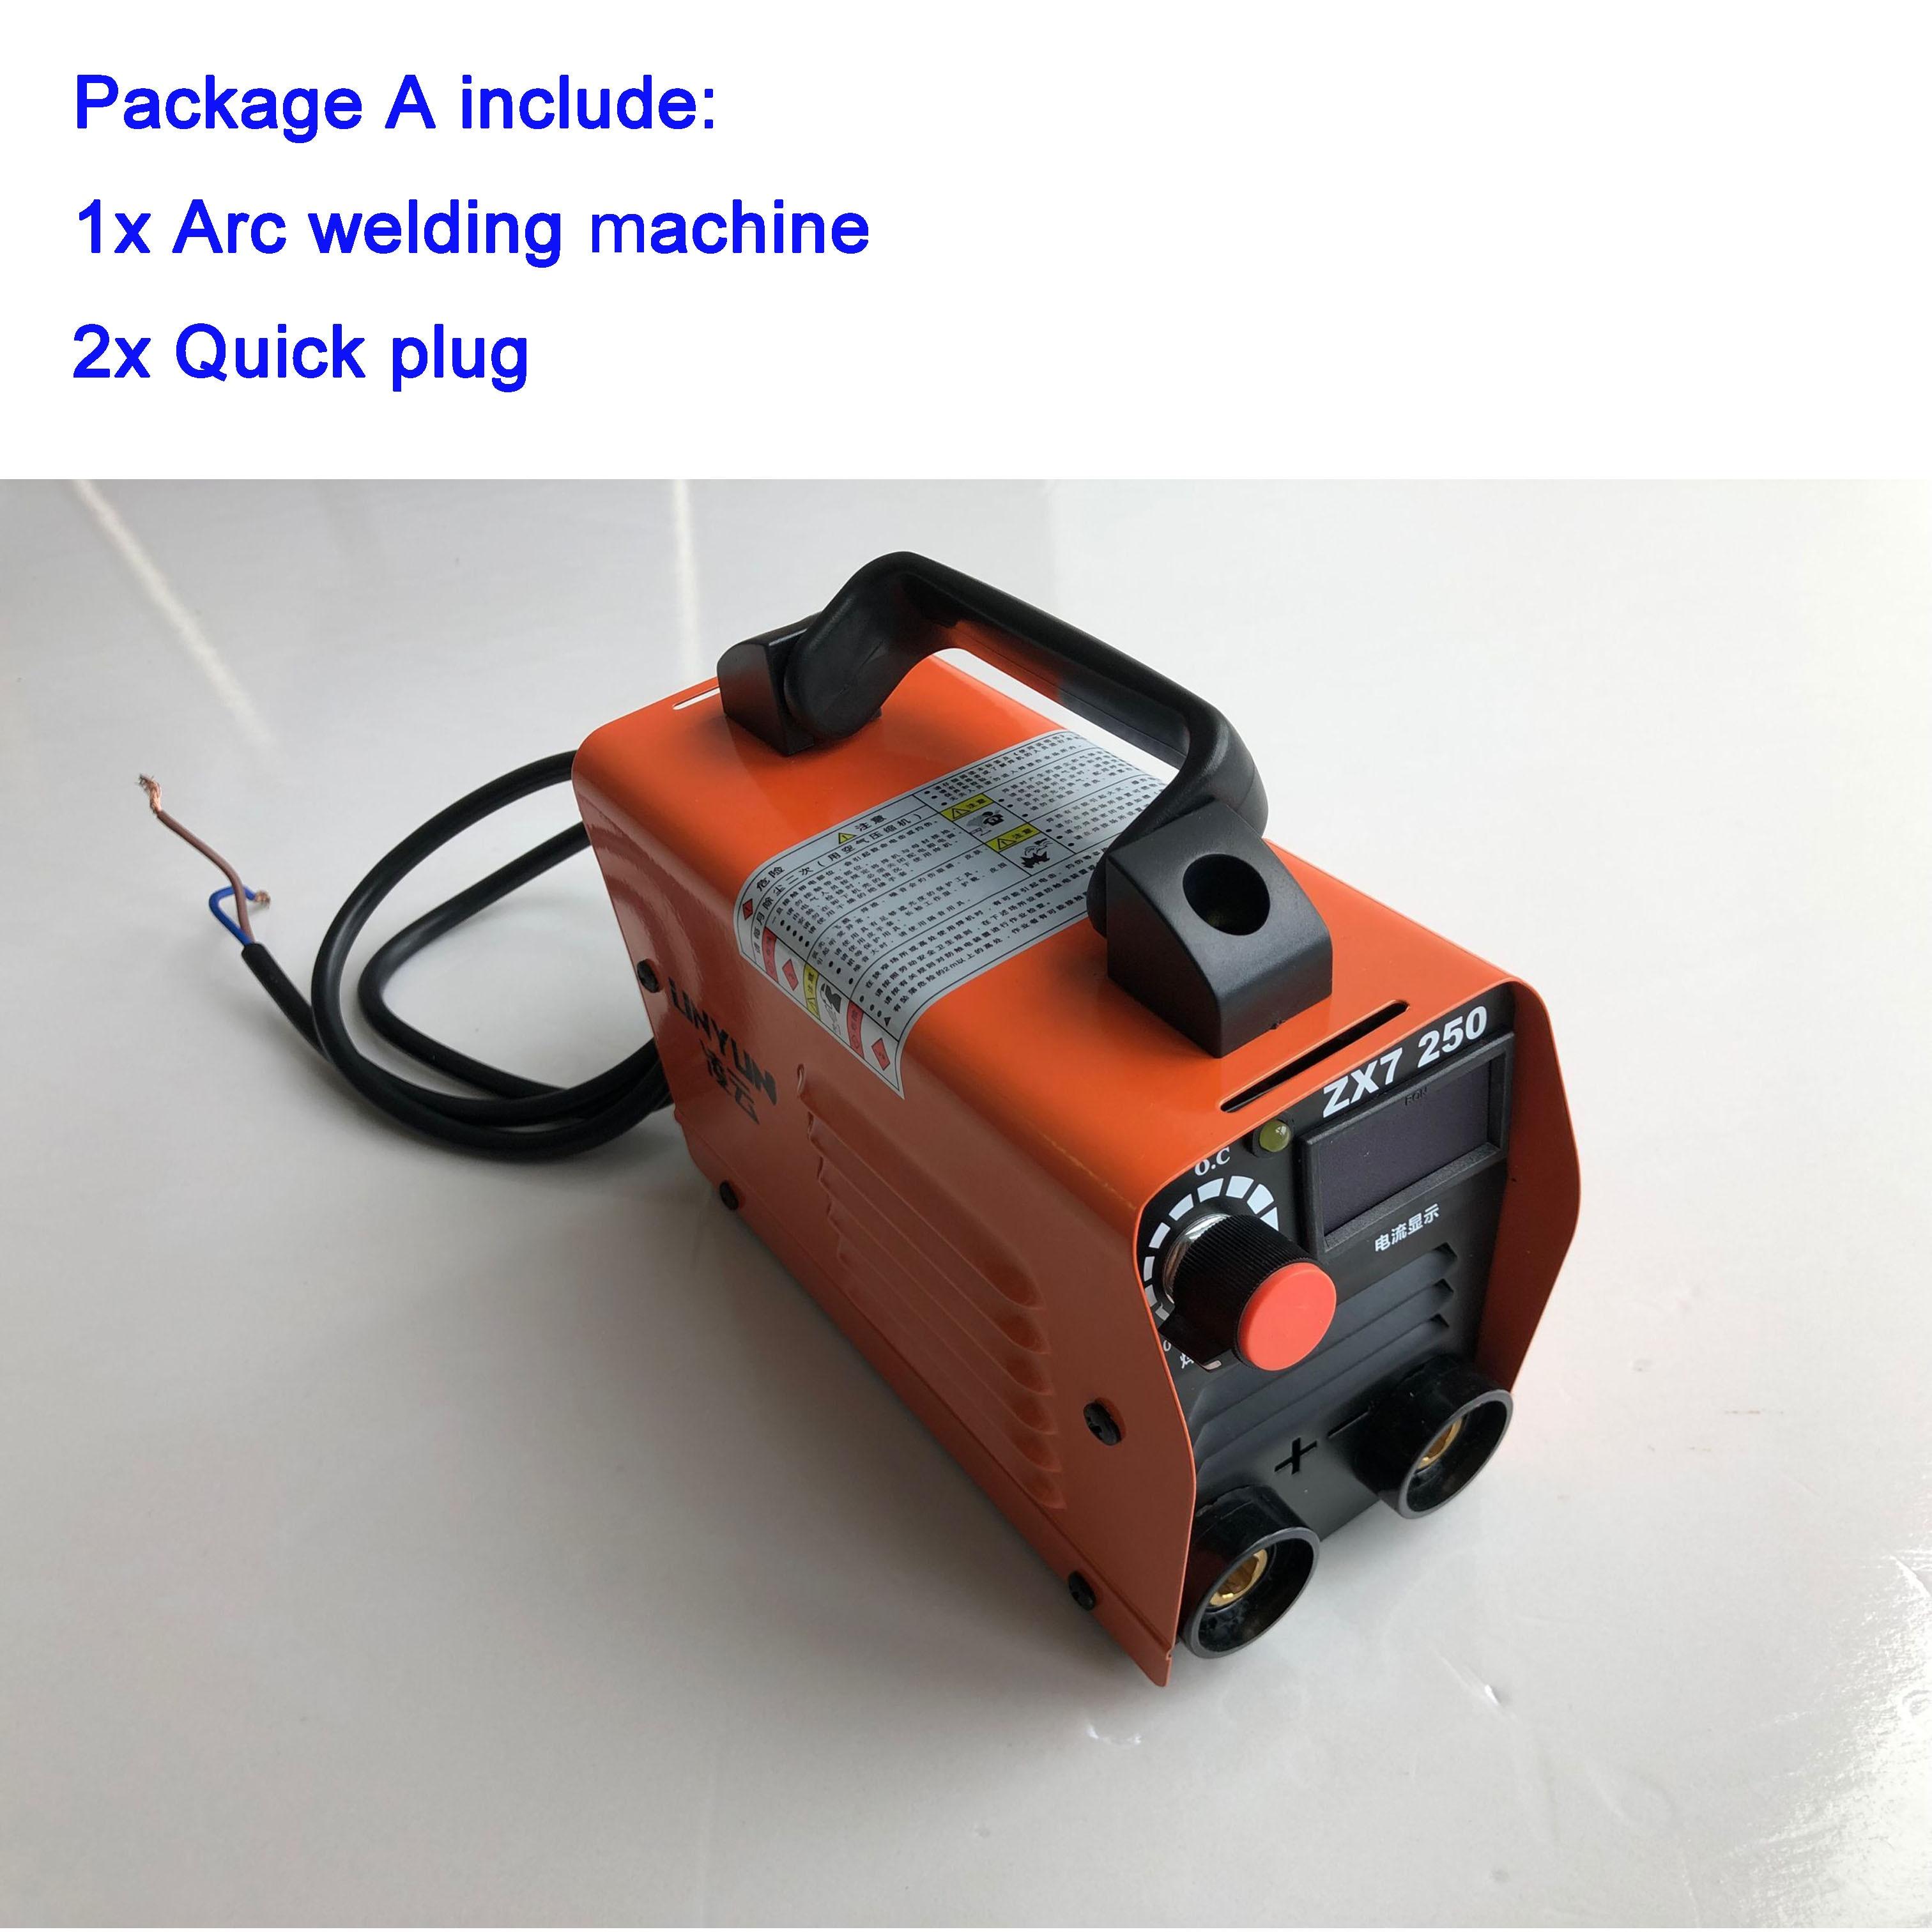 Ru delivery 250A 110-250V Compact Mini MMA Welder Inverter ARC Welding Machine Stick Welder